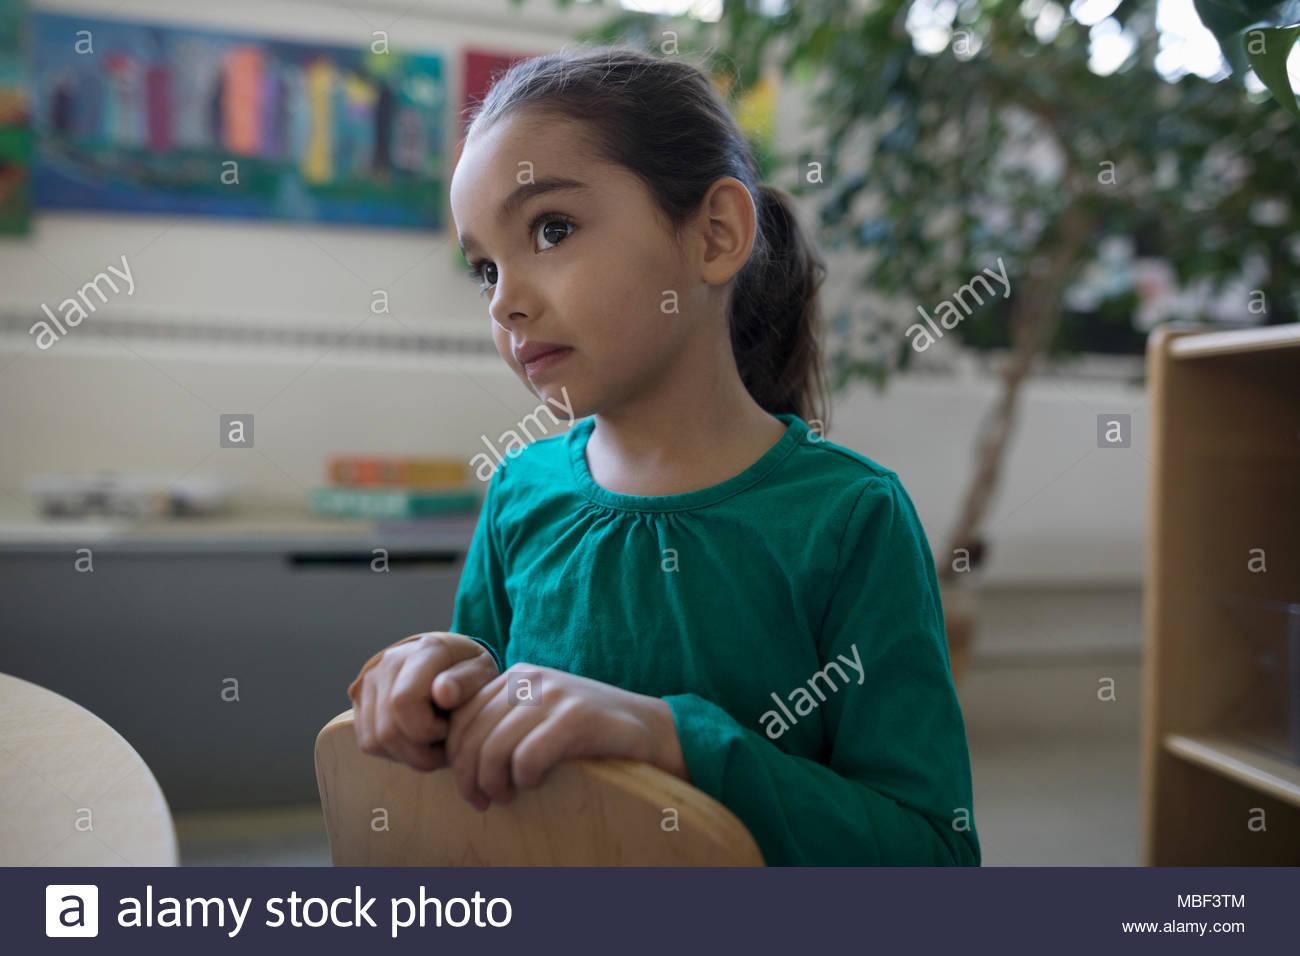 Focused, attentive preschool girl - Stock Image